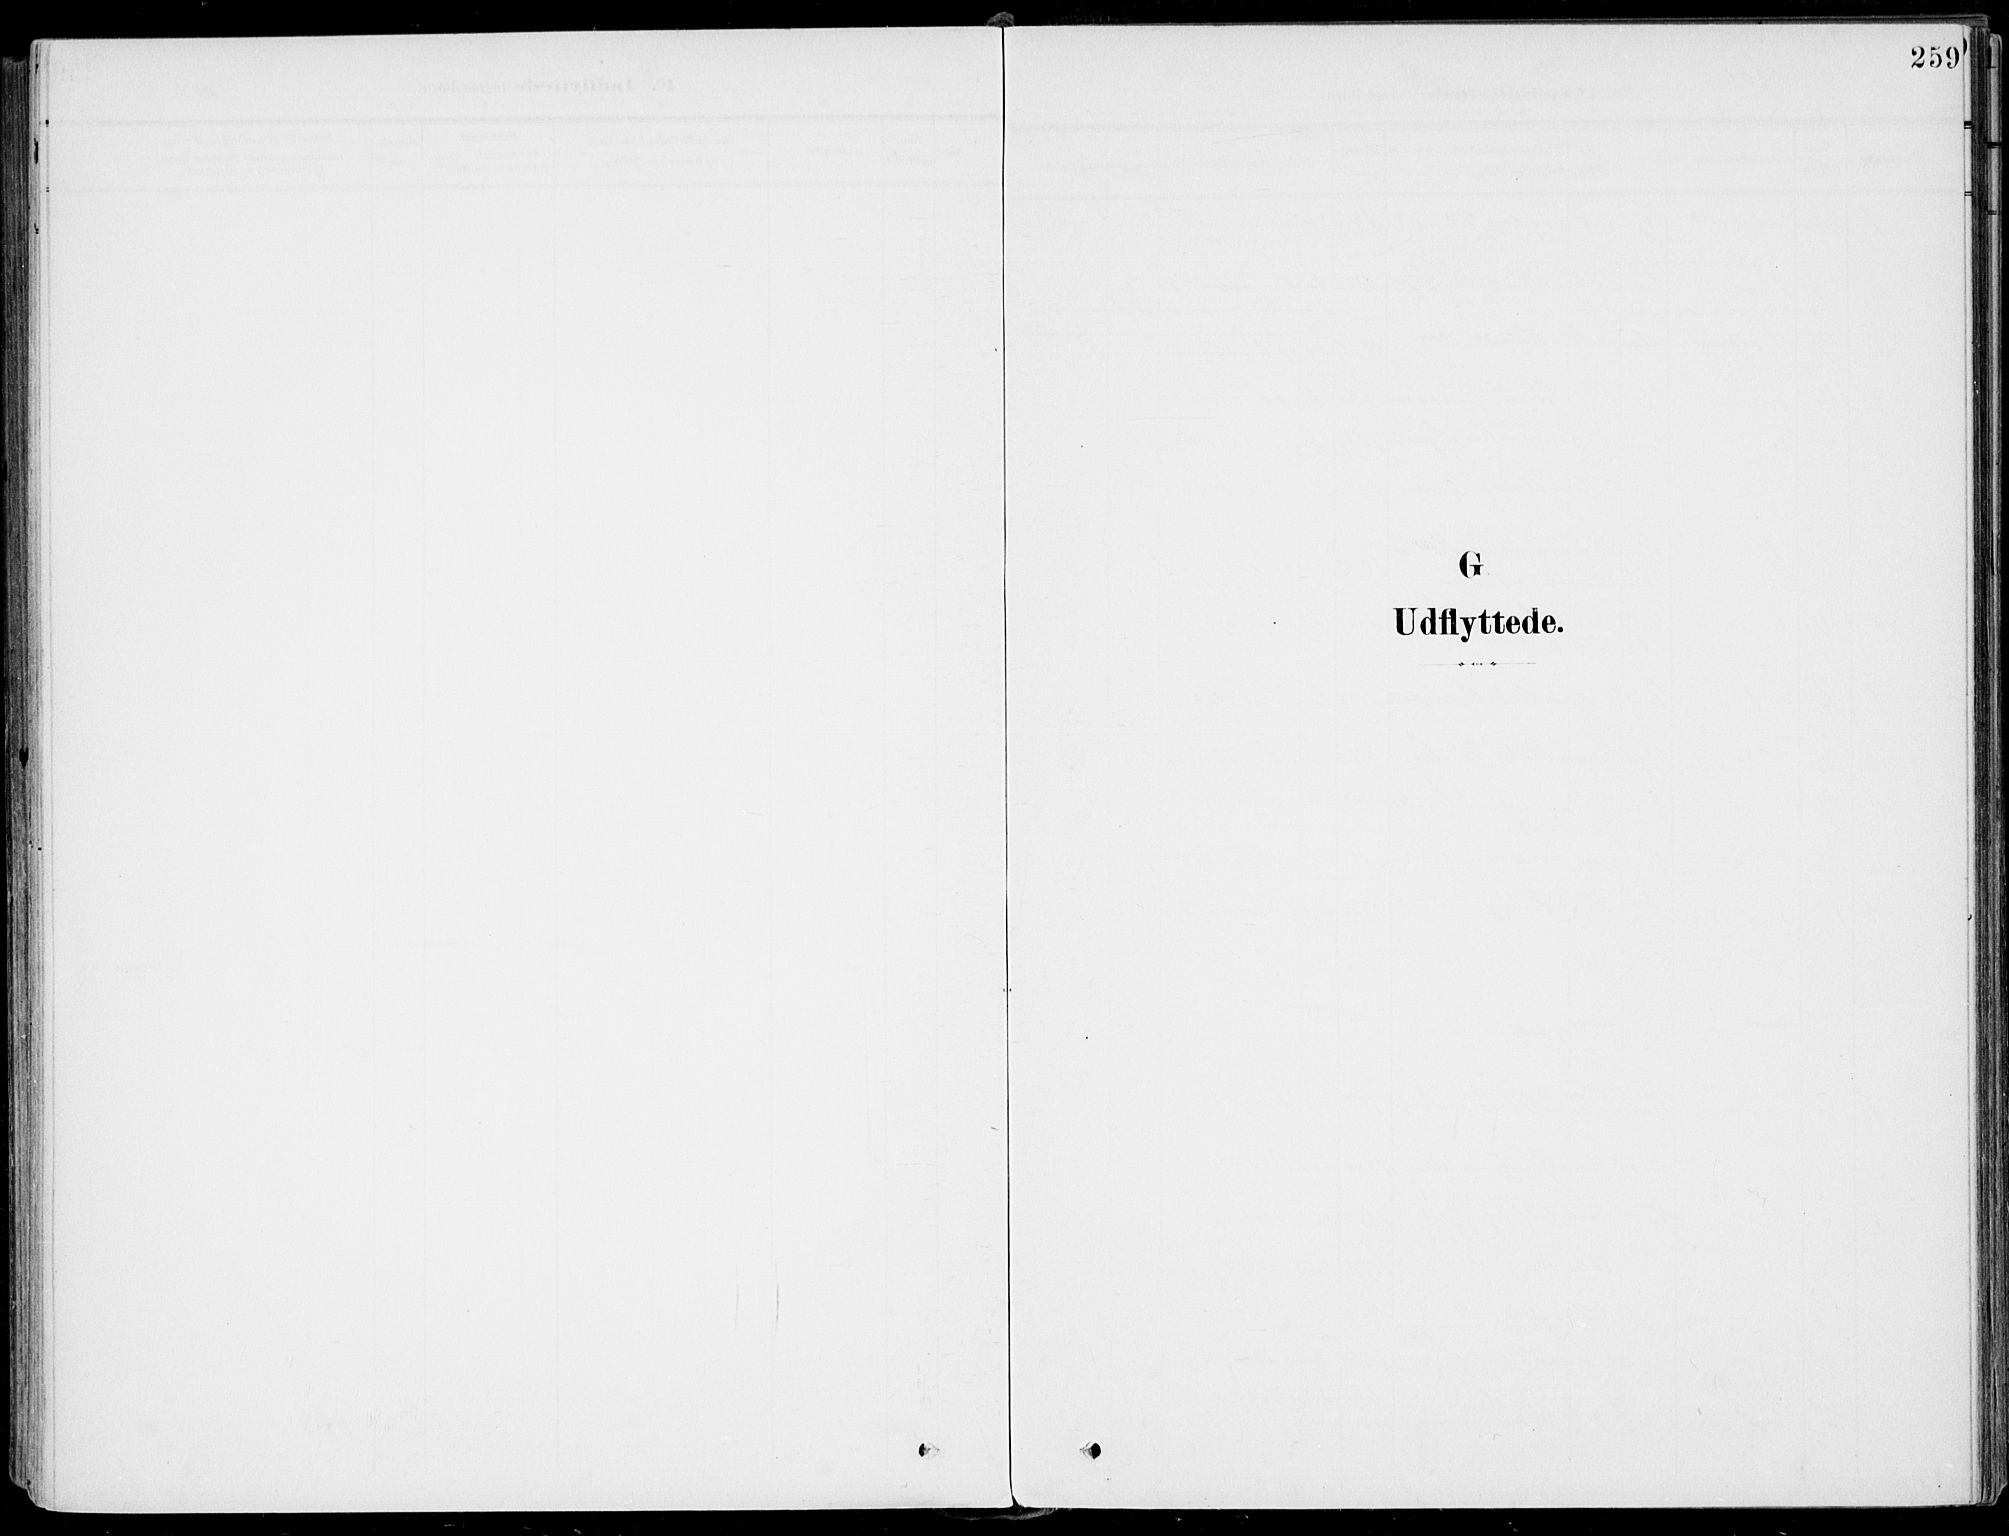 SAKO, Sigdal kirkebøker, F/Fb/L0002: Ministerialbok nr. II 2, 1901-1914, s. 259